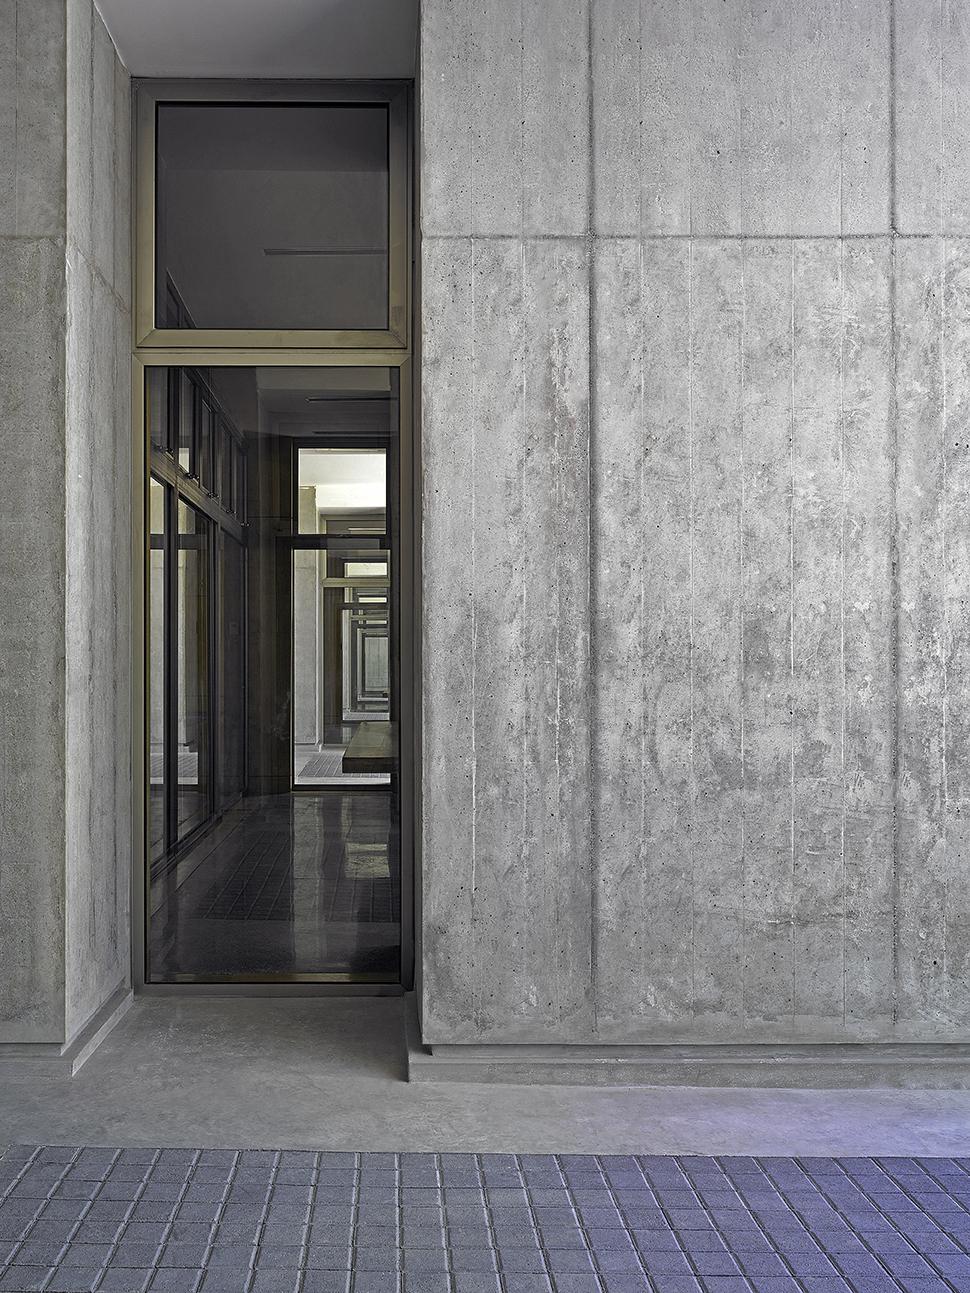 Mag corporate headquarters c re penabad architecture - Carlos domenech ...